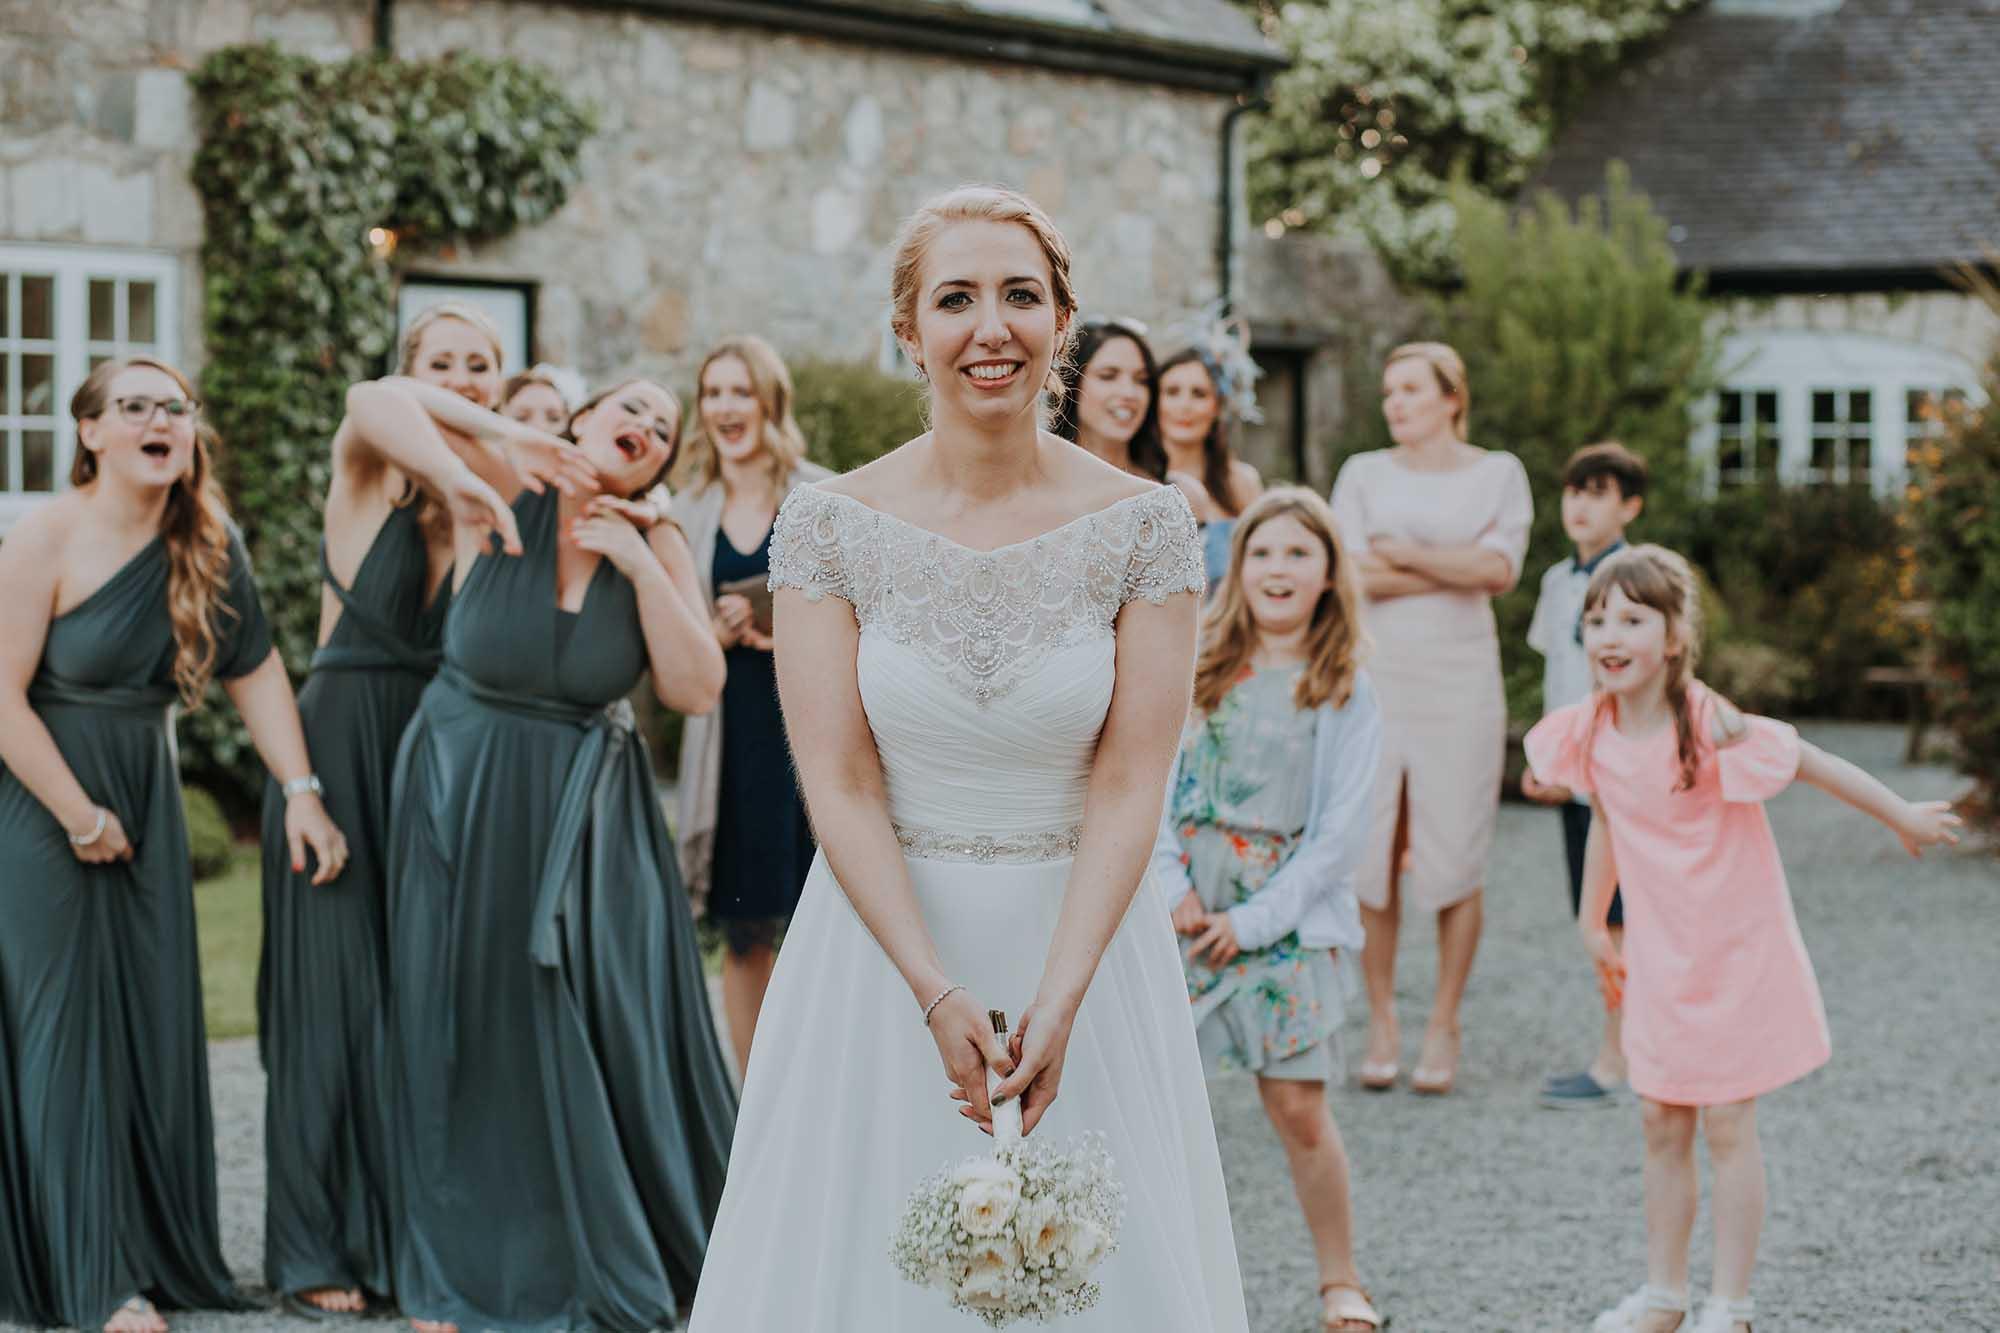 tros yr afon anglesey wedding holiday